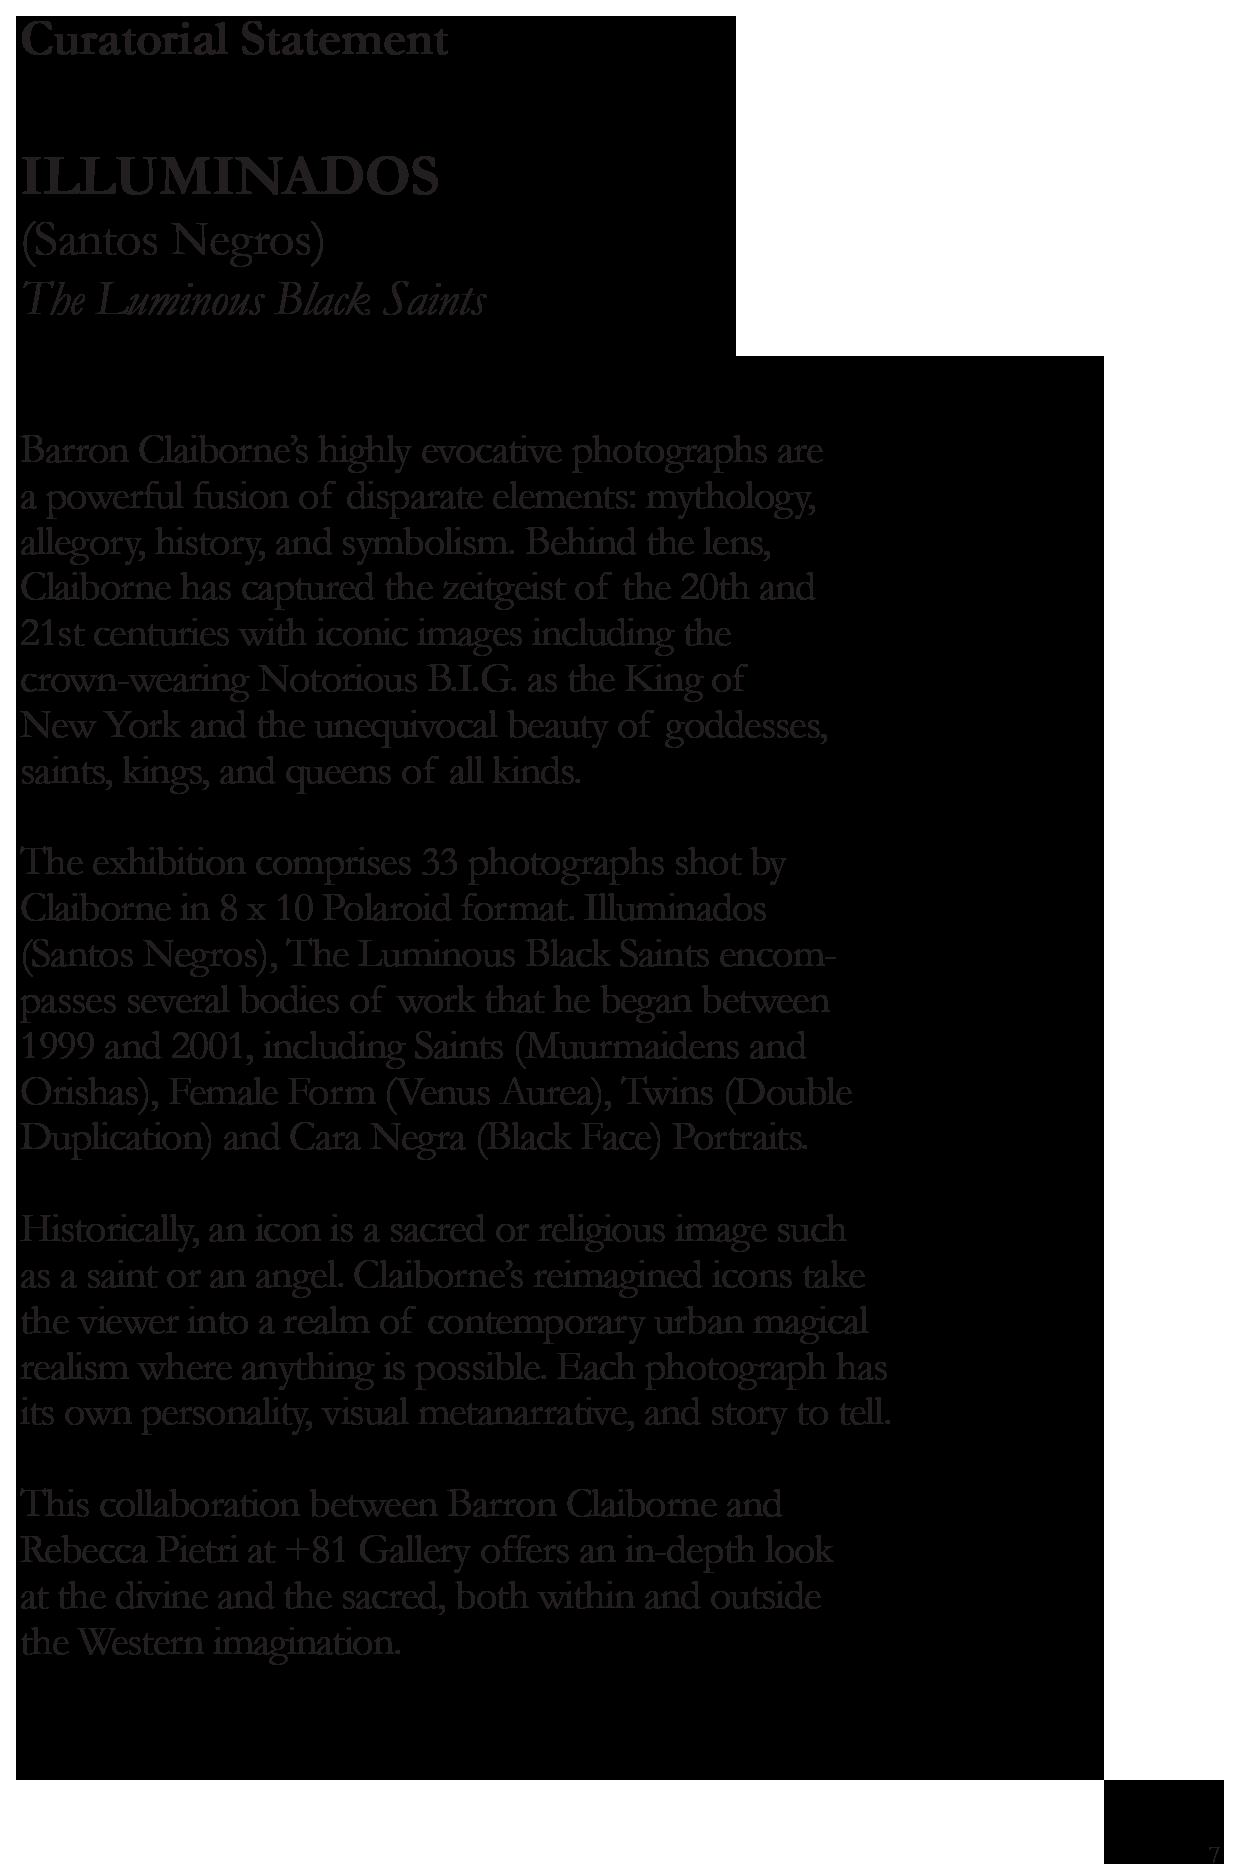 Illunminados Santos Negros_ The Luminos Black Saints _Rebecca Pietri Author _ Rebecca Pietri Curator_ +81 Gallery_Barron Claiborne photographer-7.png